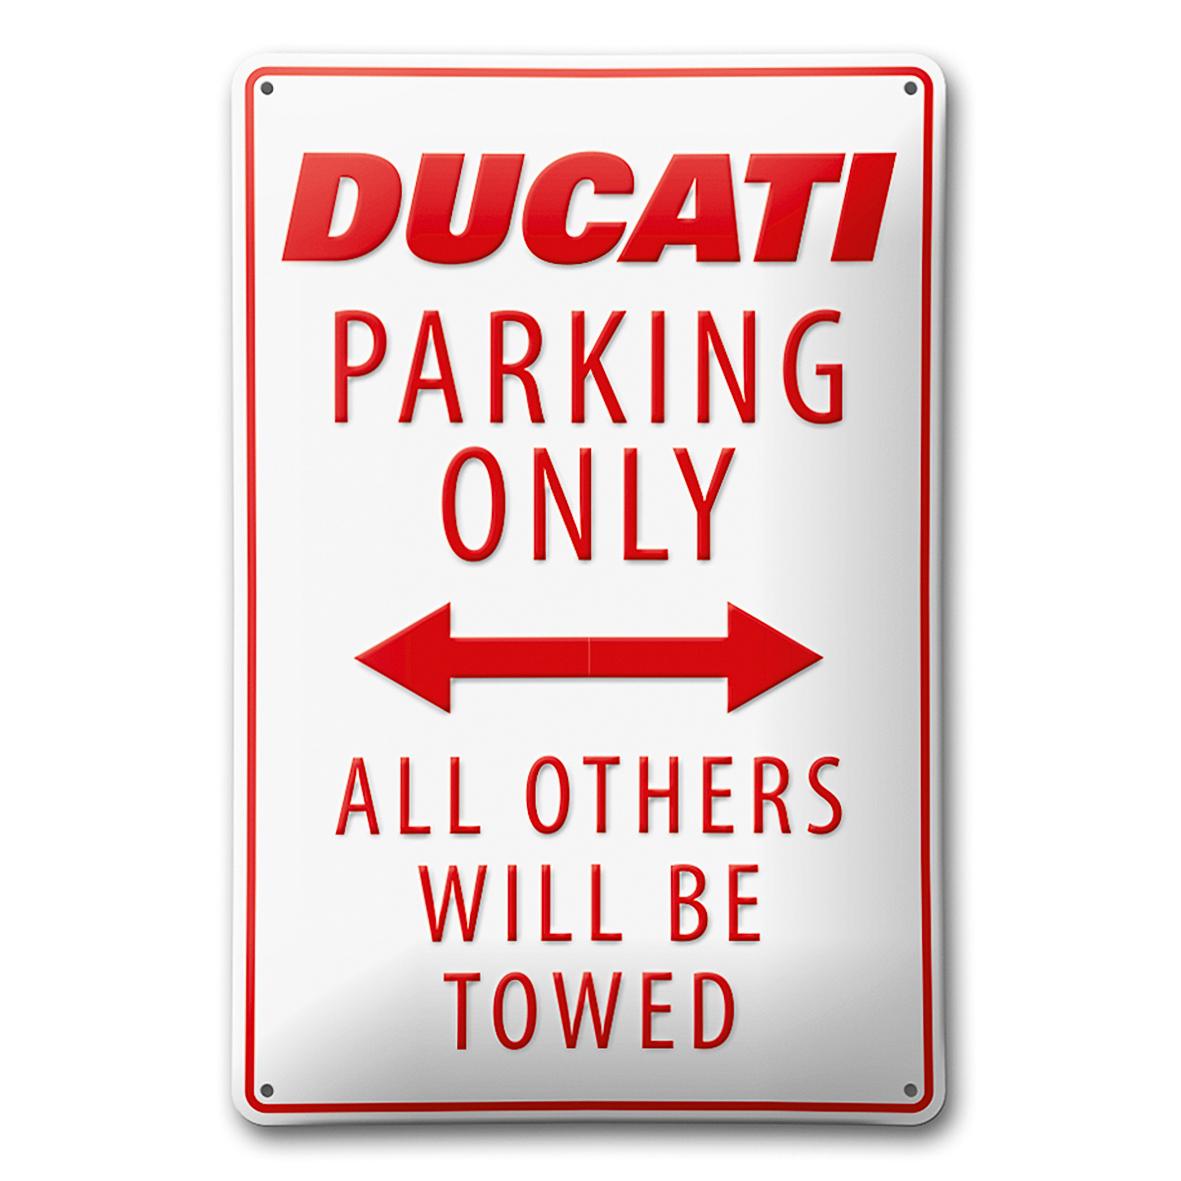 Ducati Parking - Metal plate 987694028